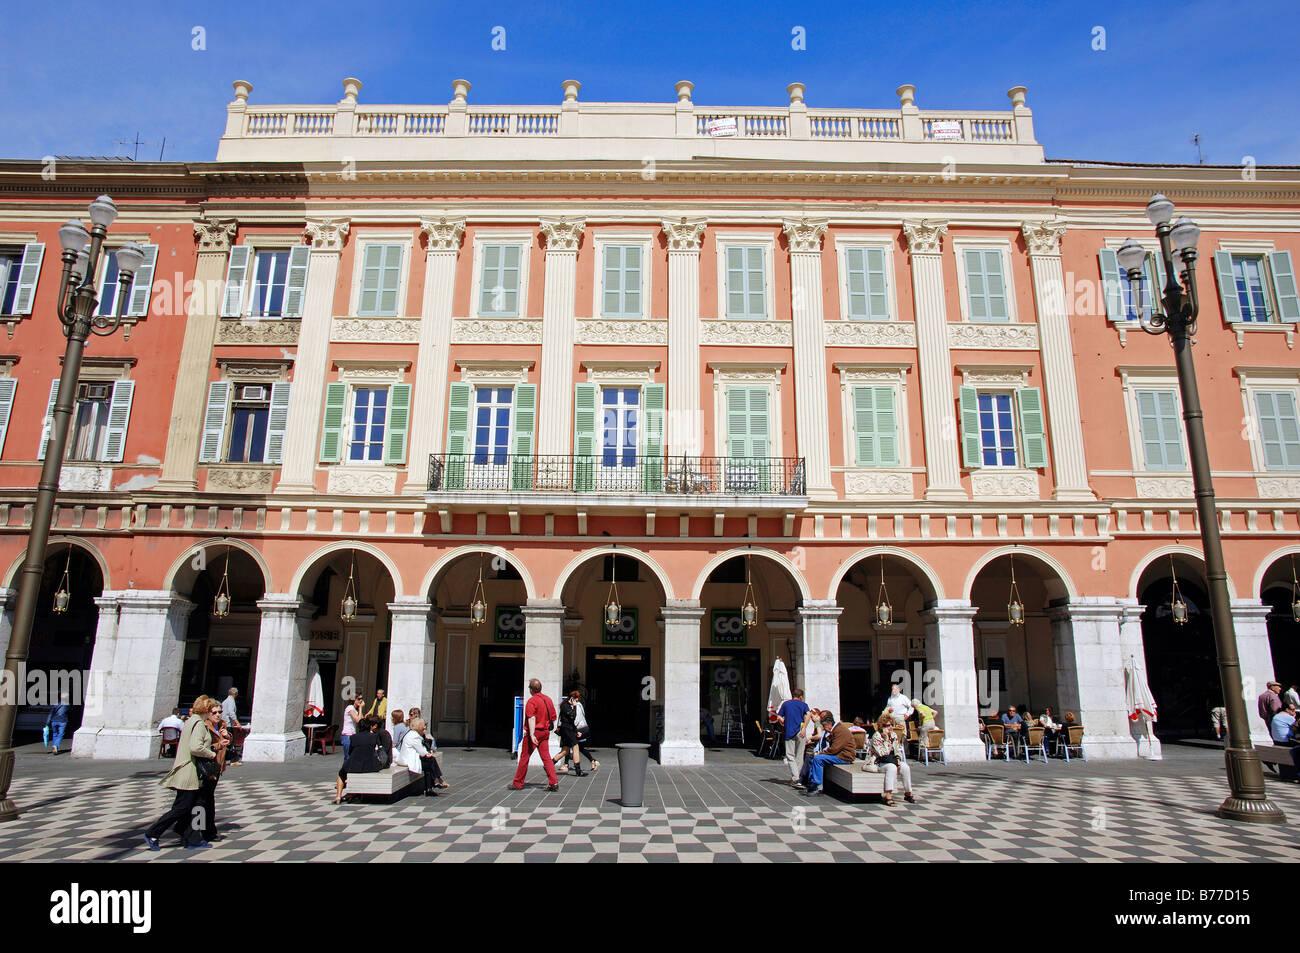 Building with shops and restaurants, arcades, Place Massena, Nice, Alpes-Maritimes, Provence-Alpes-Cote d'Azur, - Stock Image